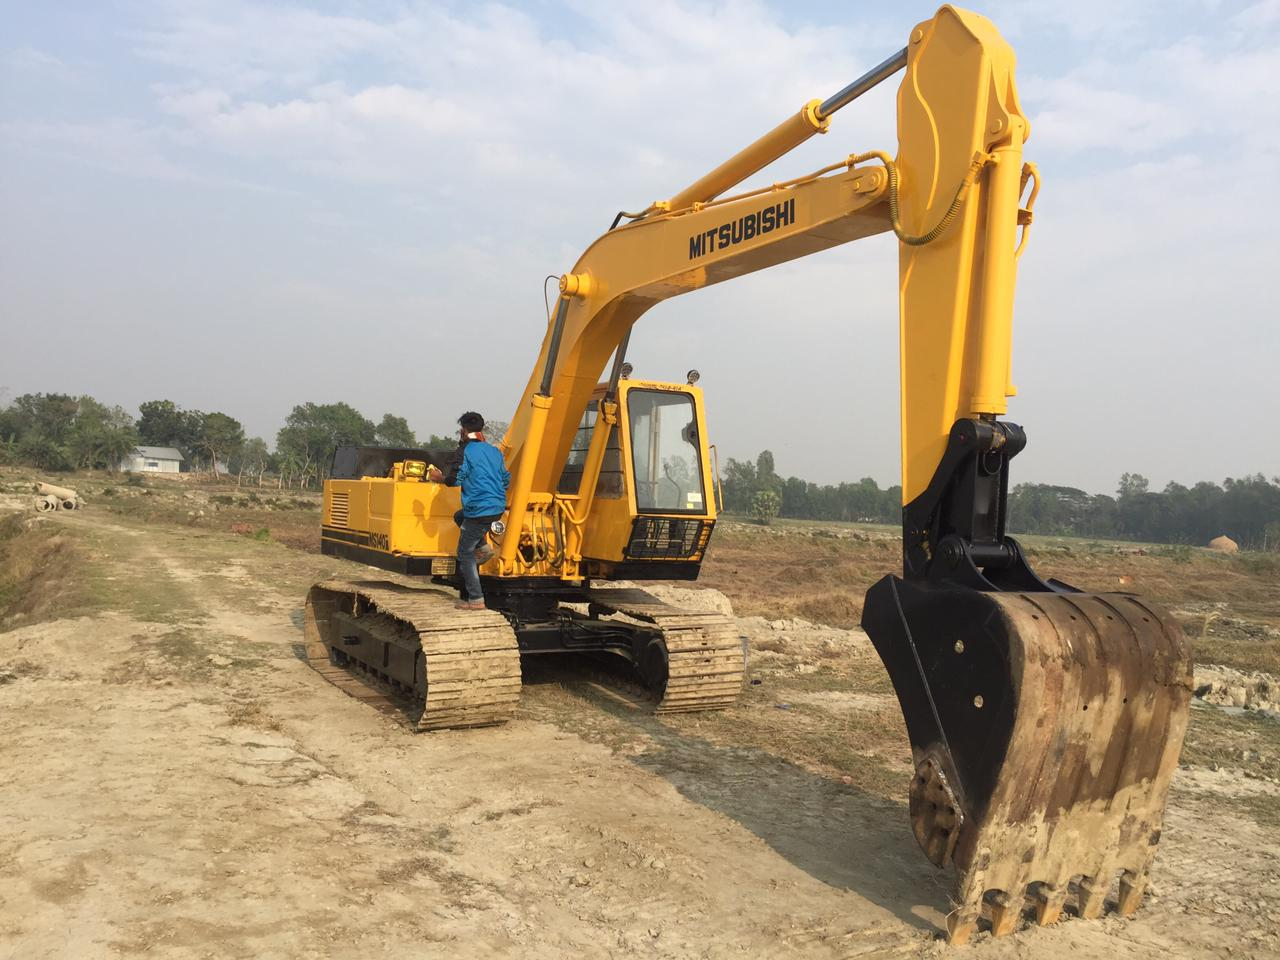 Rentctg heavy equipment rental-Review-gallery